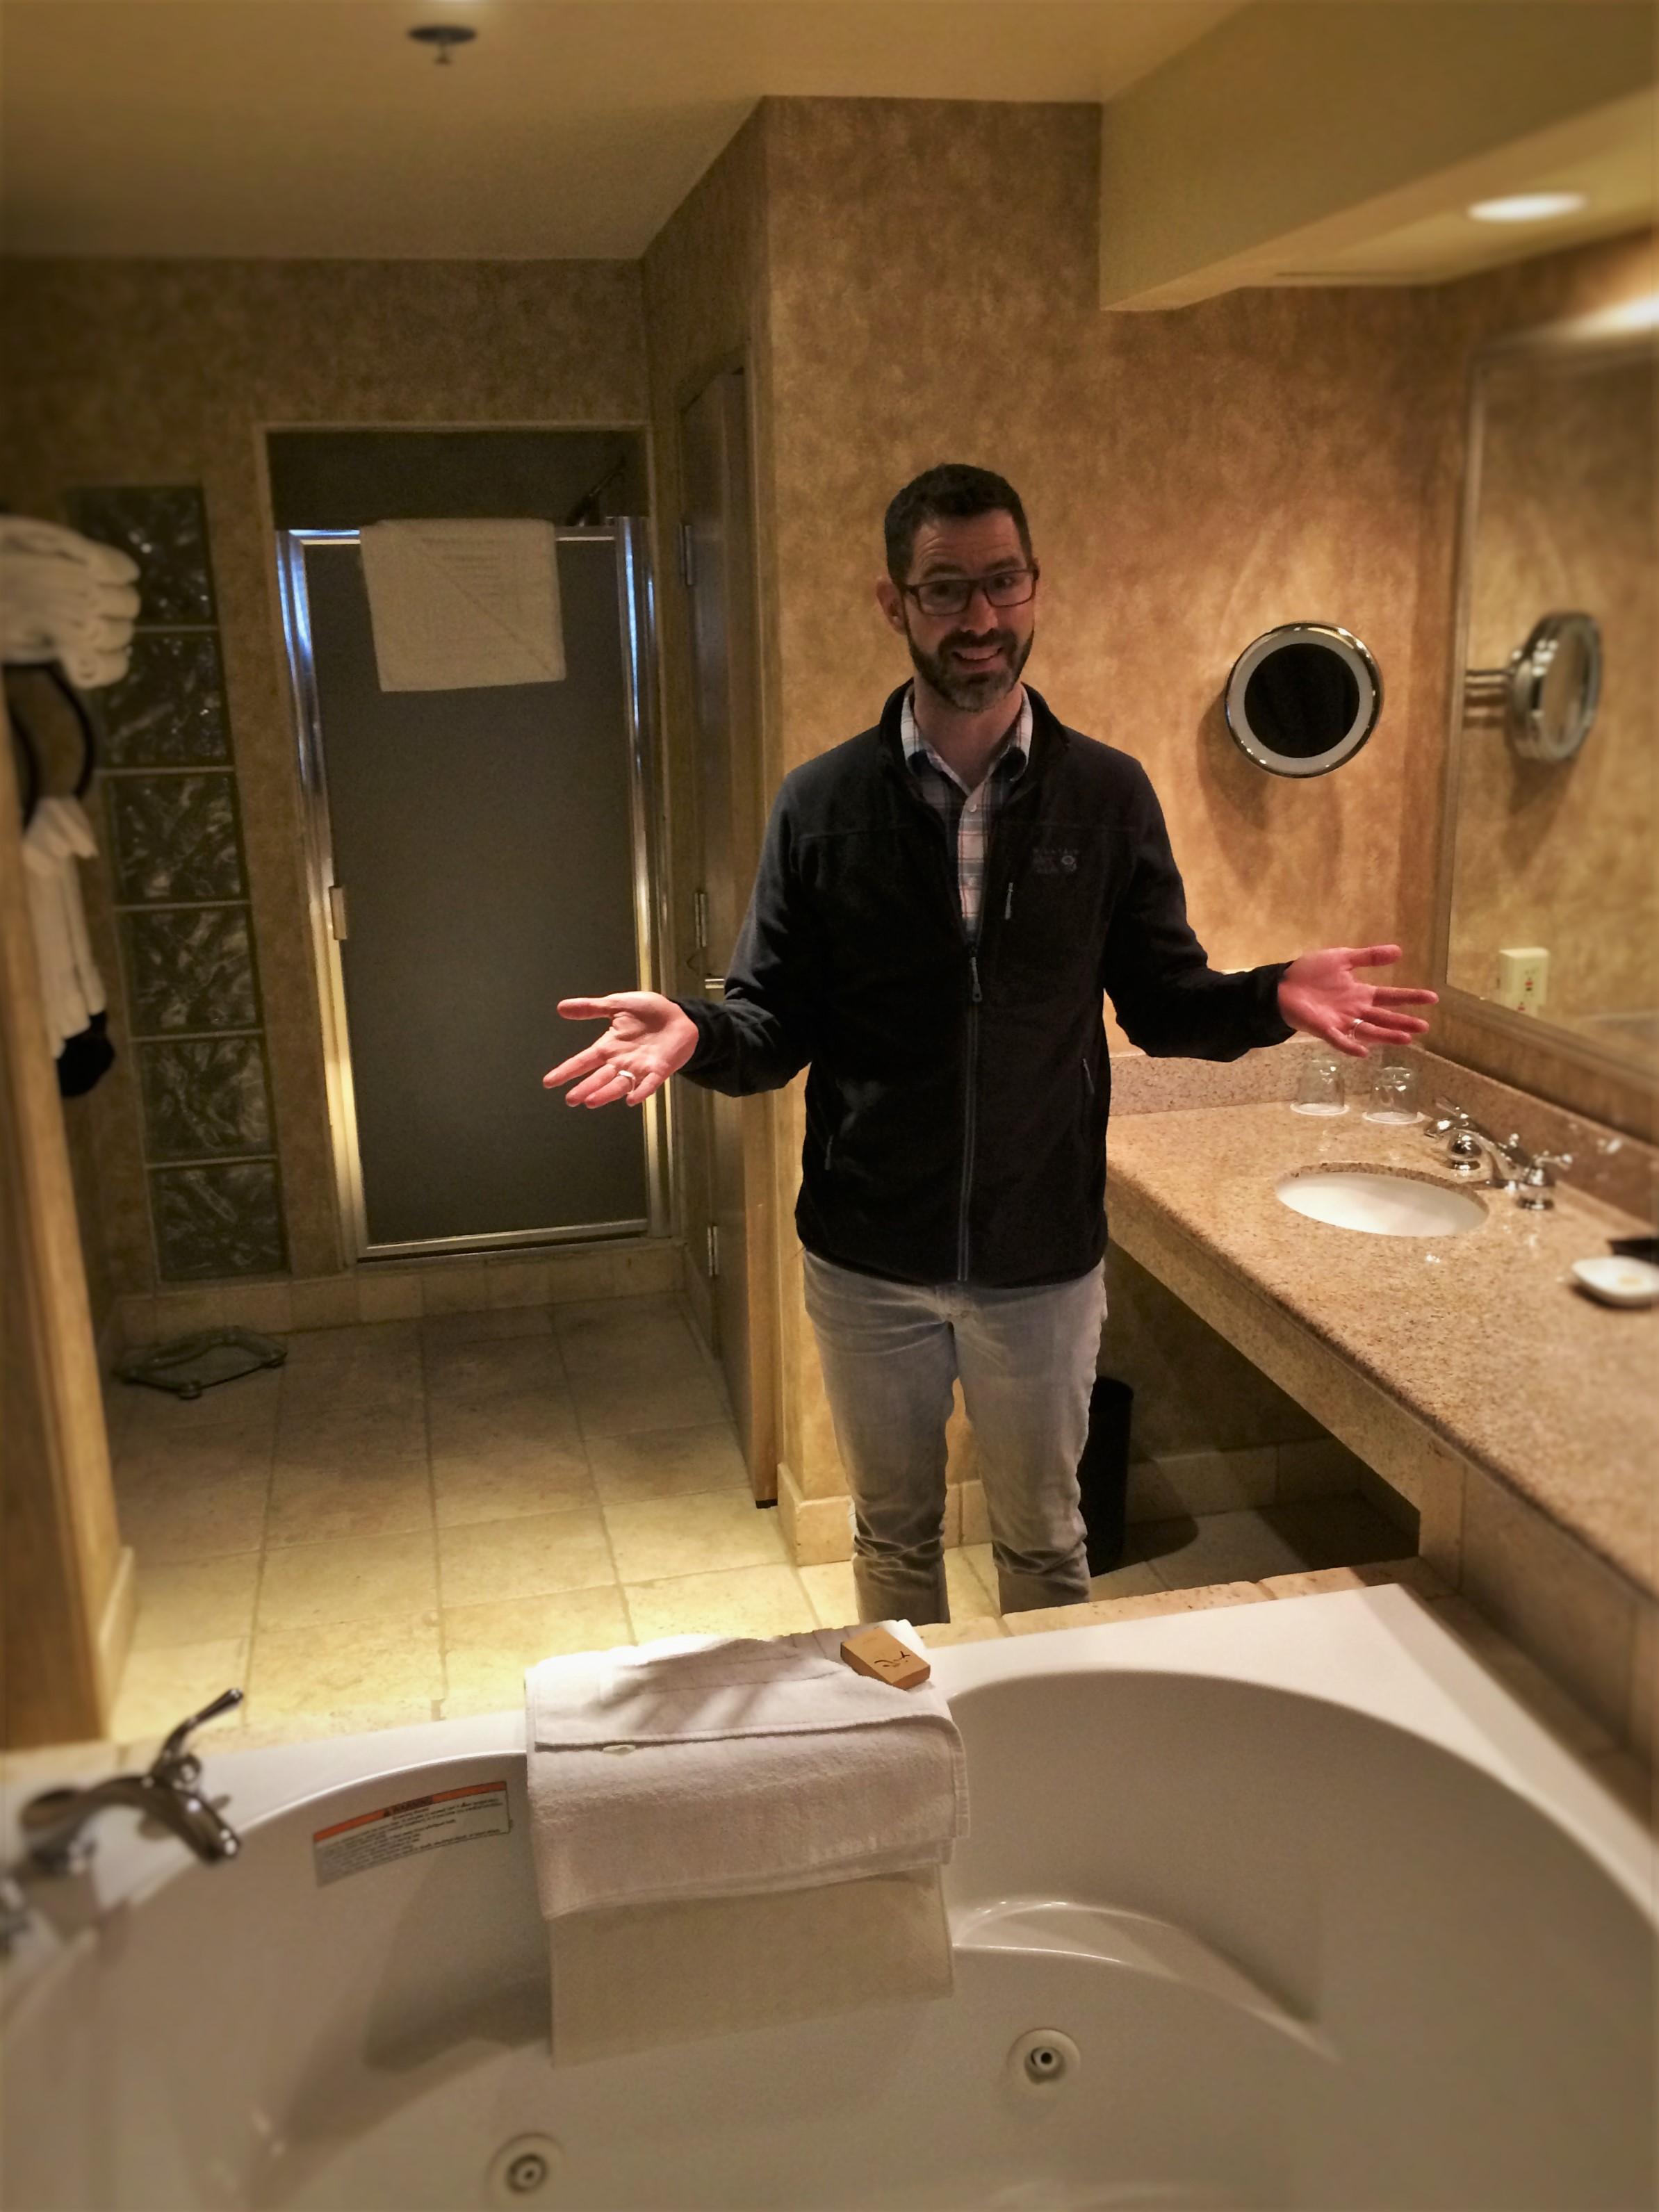 Chris Taylor and jetted tub at Tenaya Lodge Yosemite 1